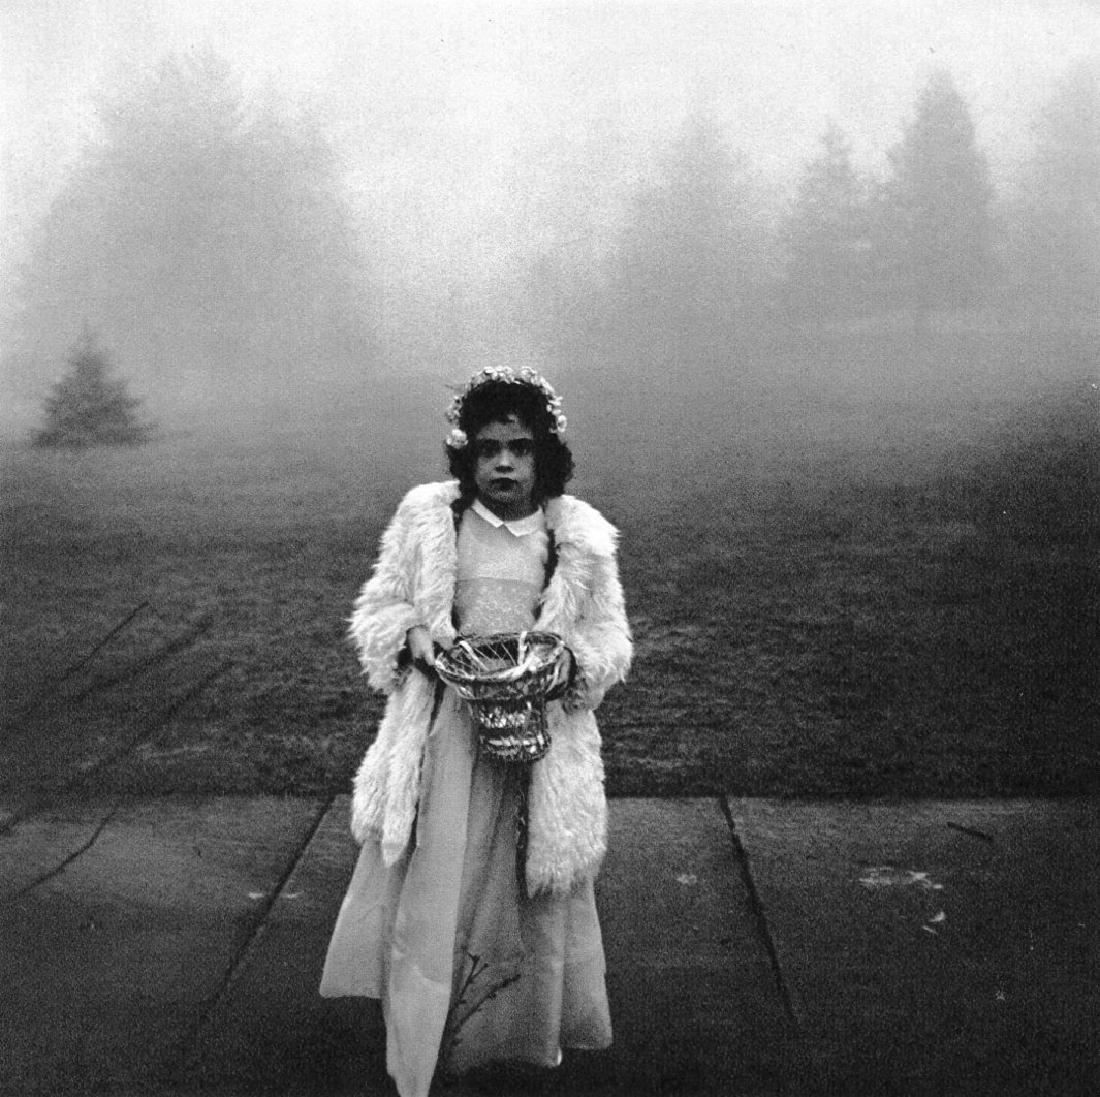 DIANE ARBUS - A Flower Girl at a Wedding, 1964